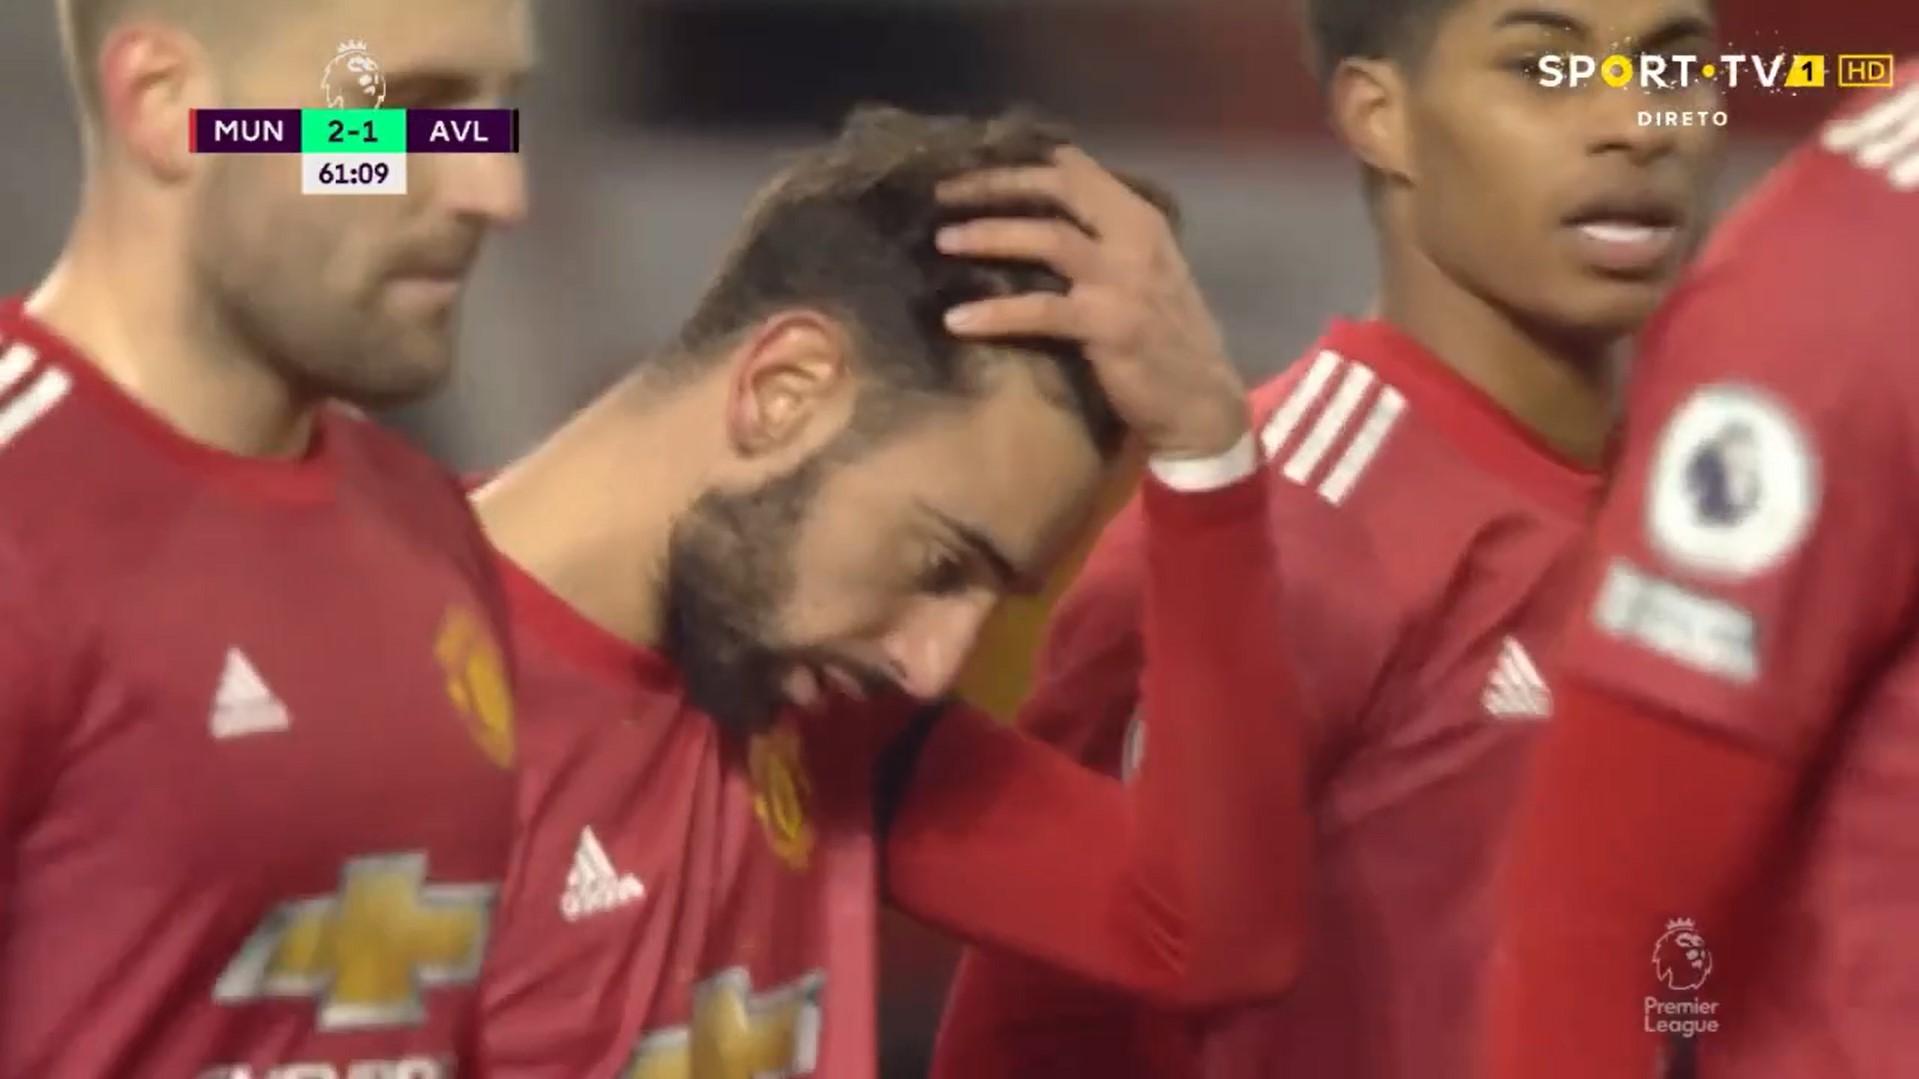 Premier League (17ª Jornada): Resumo Man. United 2-1 Aston Villa